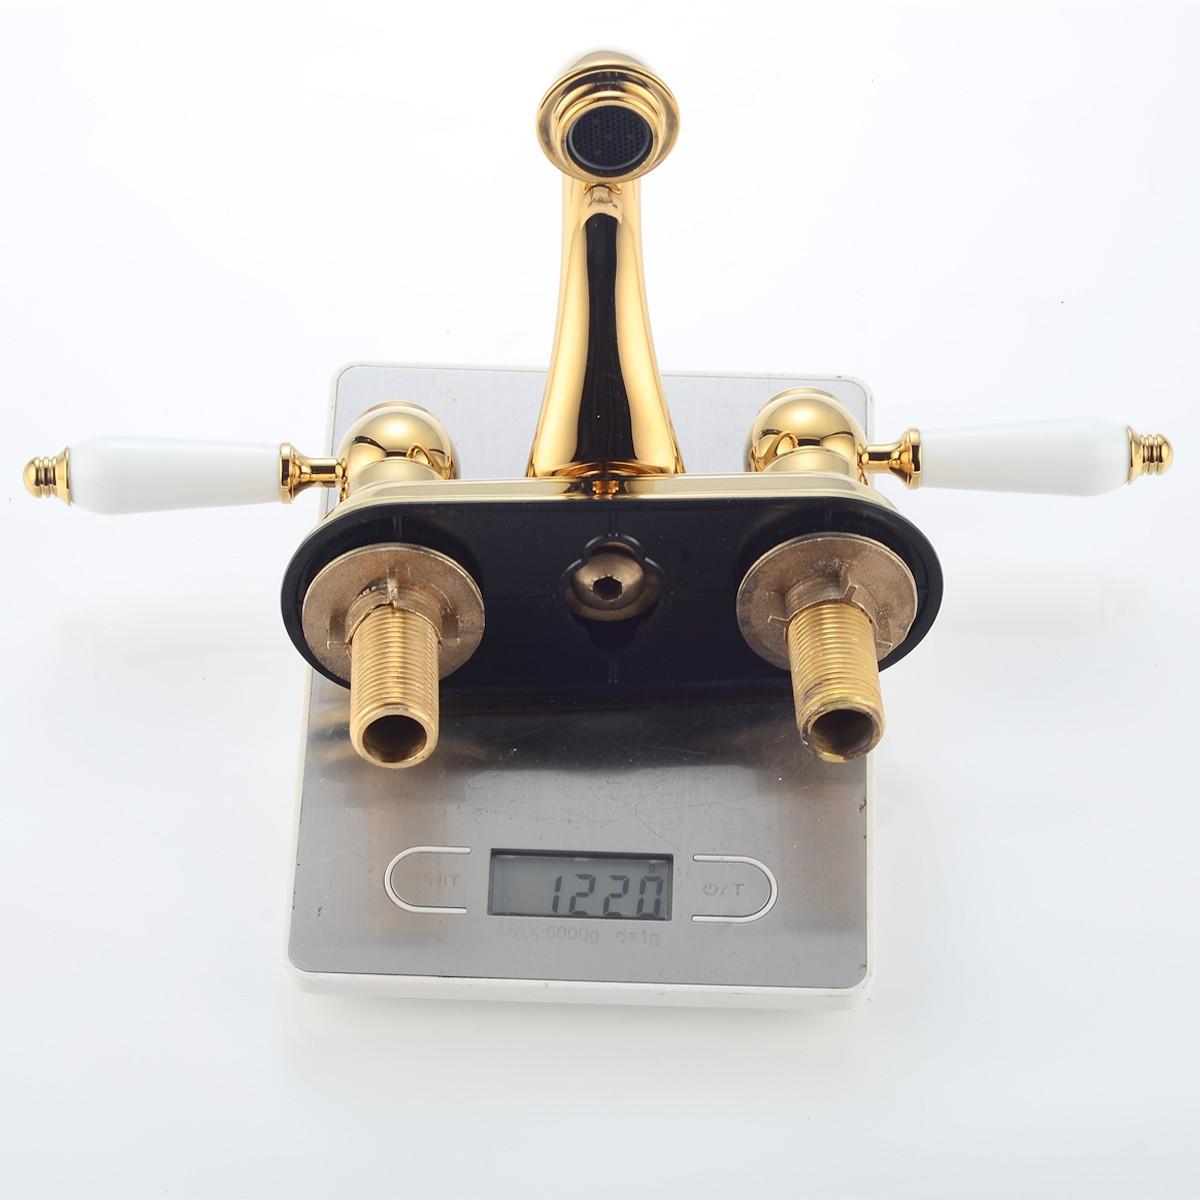 Brass Centset Bathroom Sink Faucet La Bella Design Includes Supply Lines Centerset Faucet Center set Faucet Bathroom 4 Sink Faucet